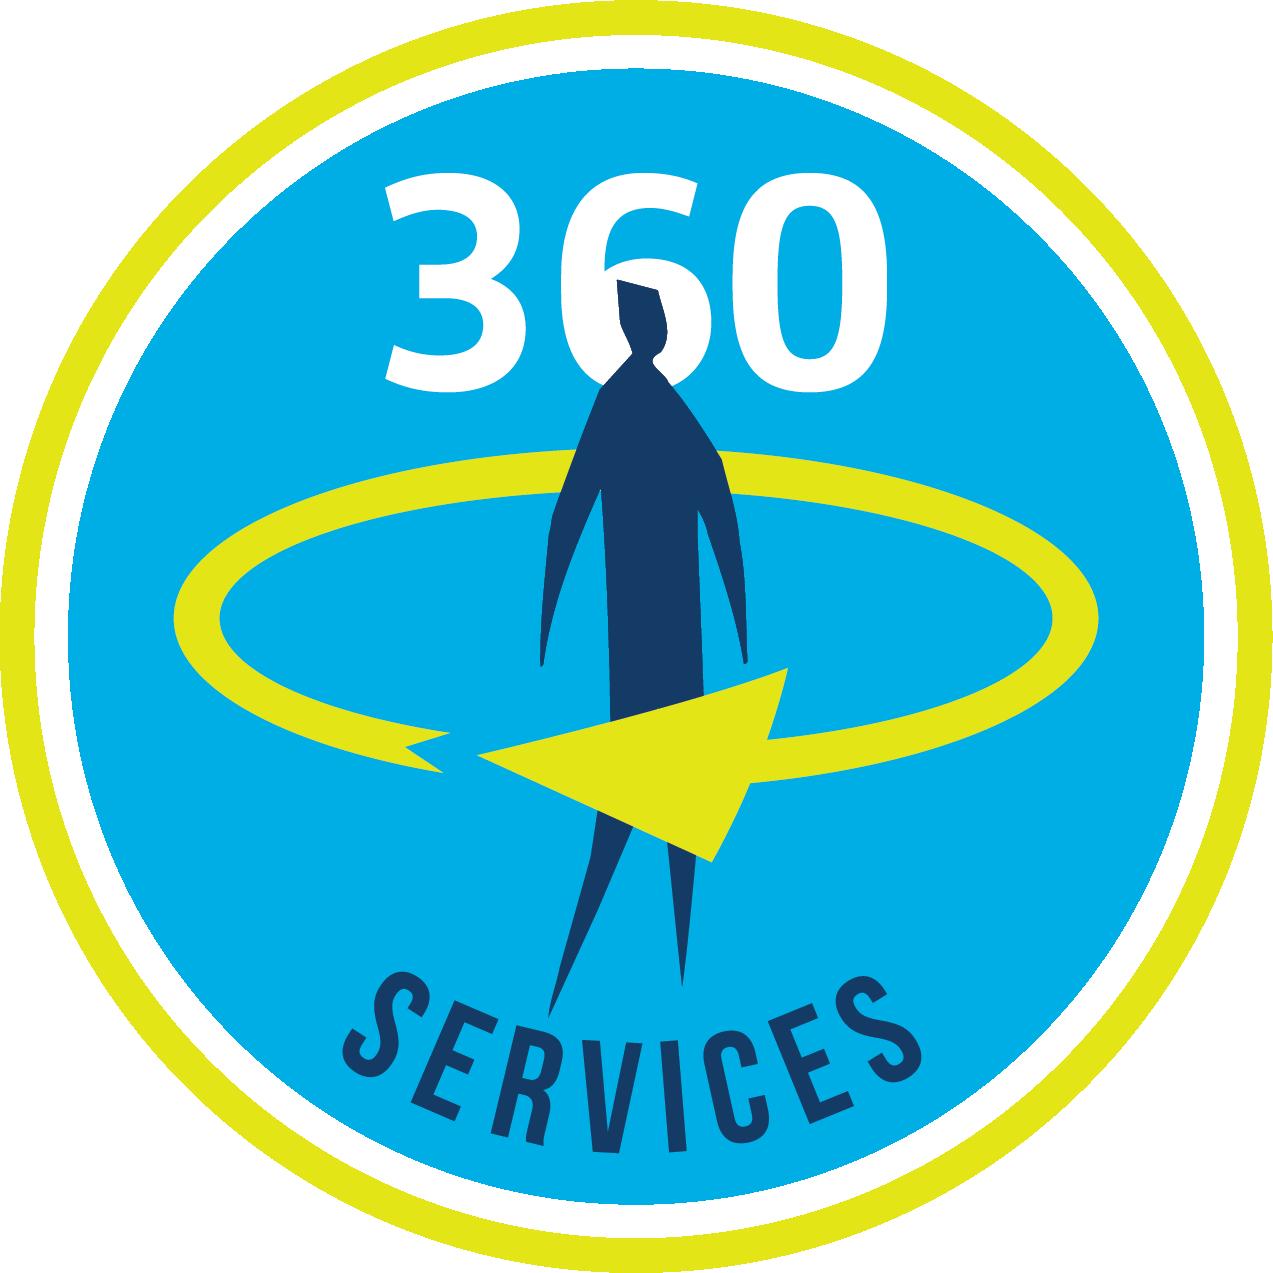 aclvb-universele_diensten-logo-cmyk_ok_fr_5.png